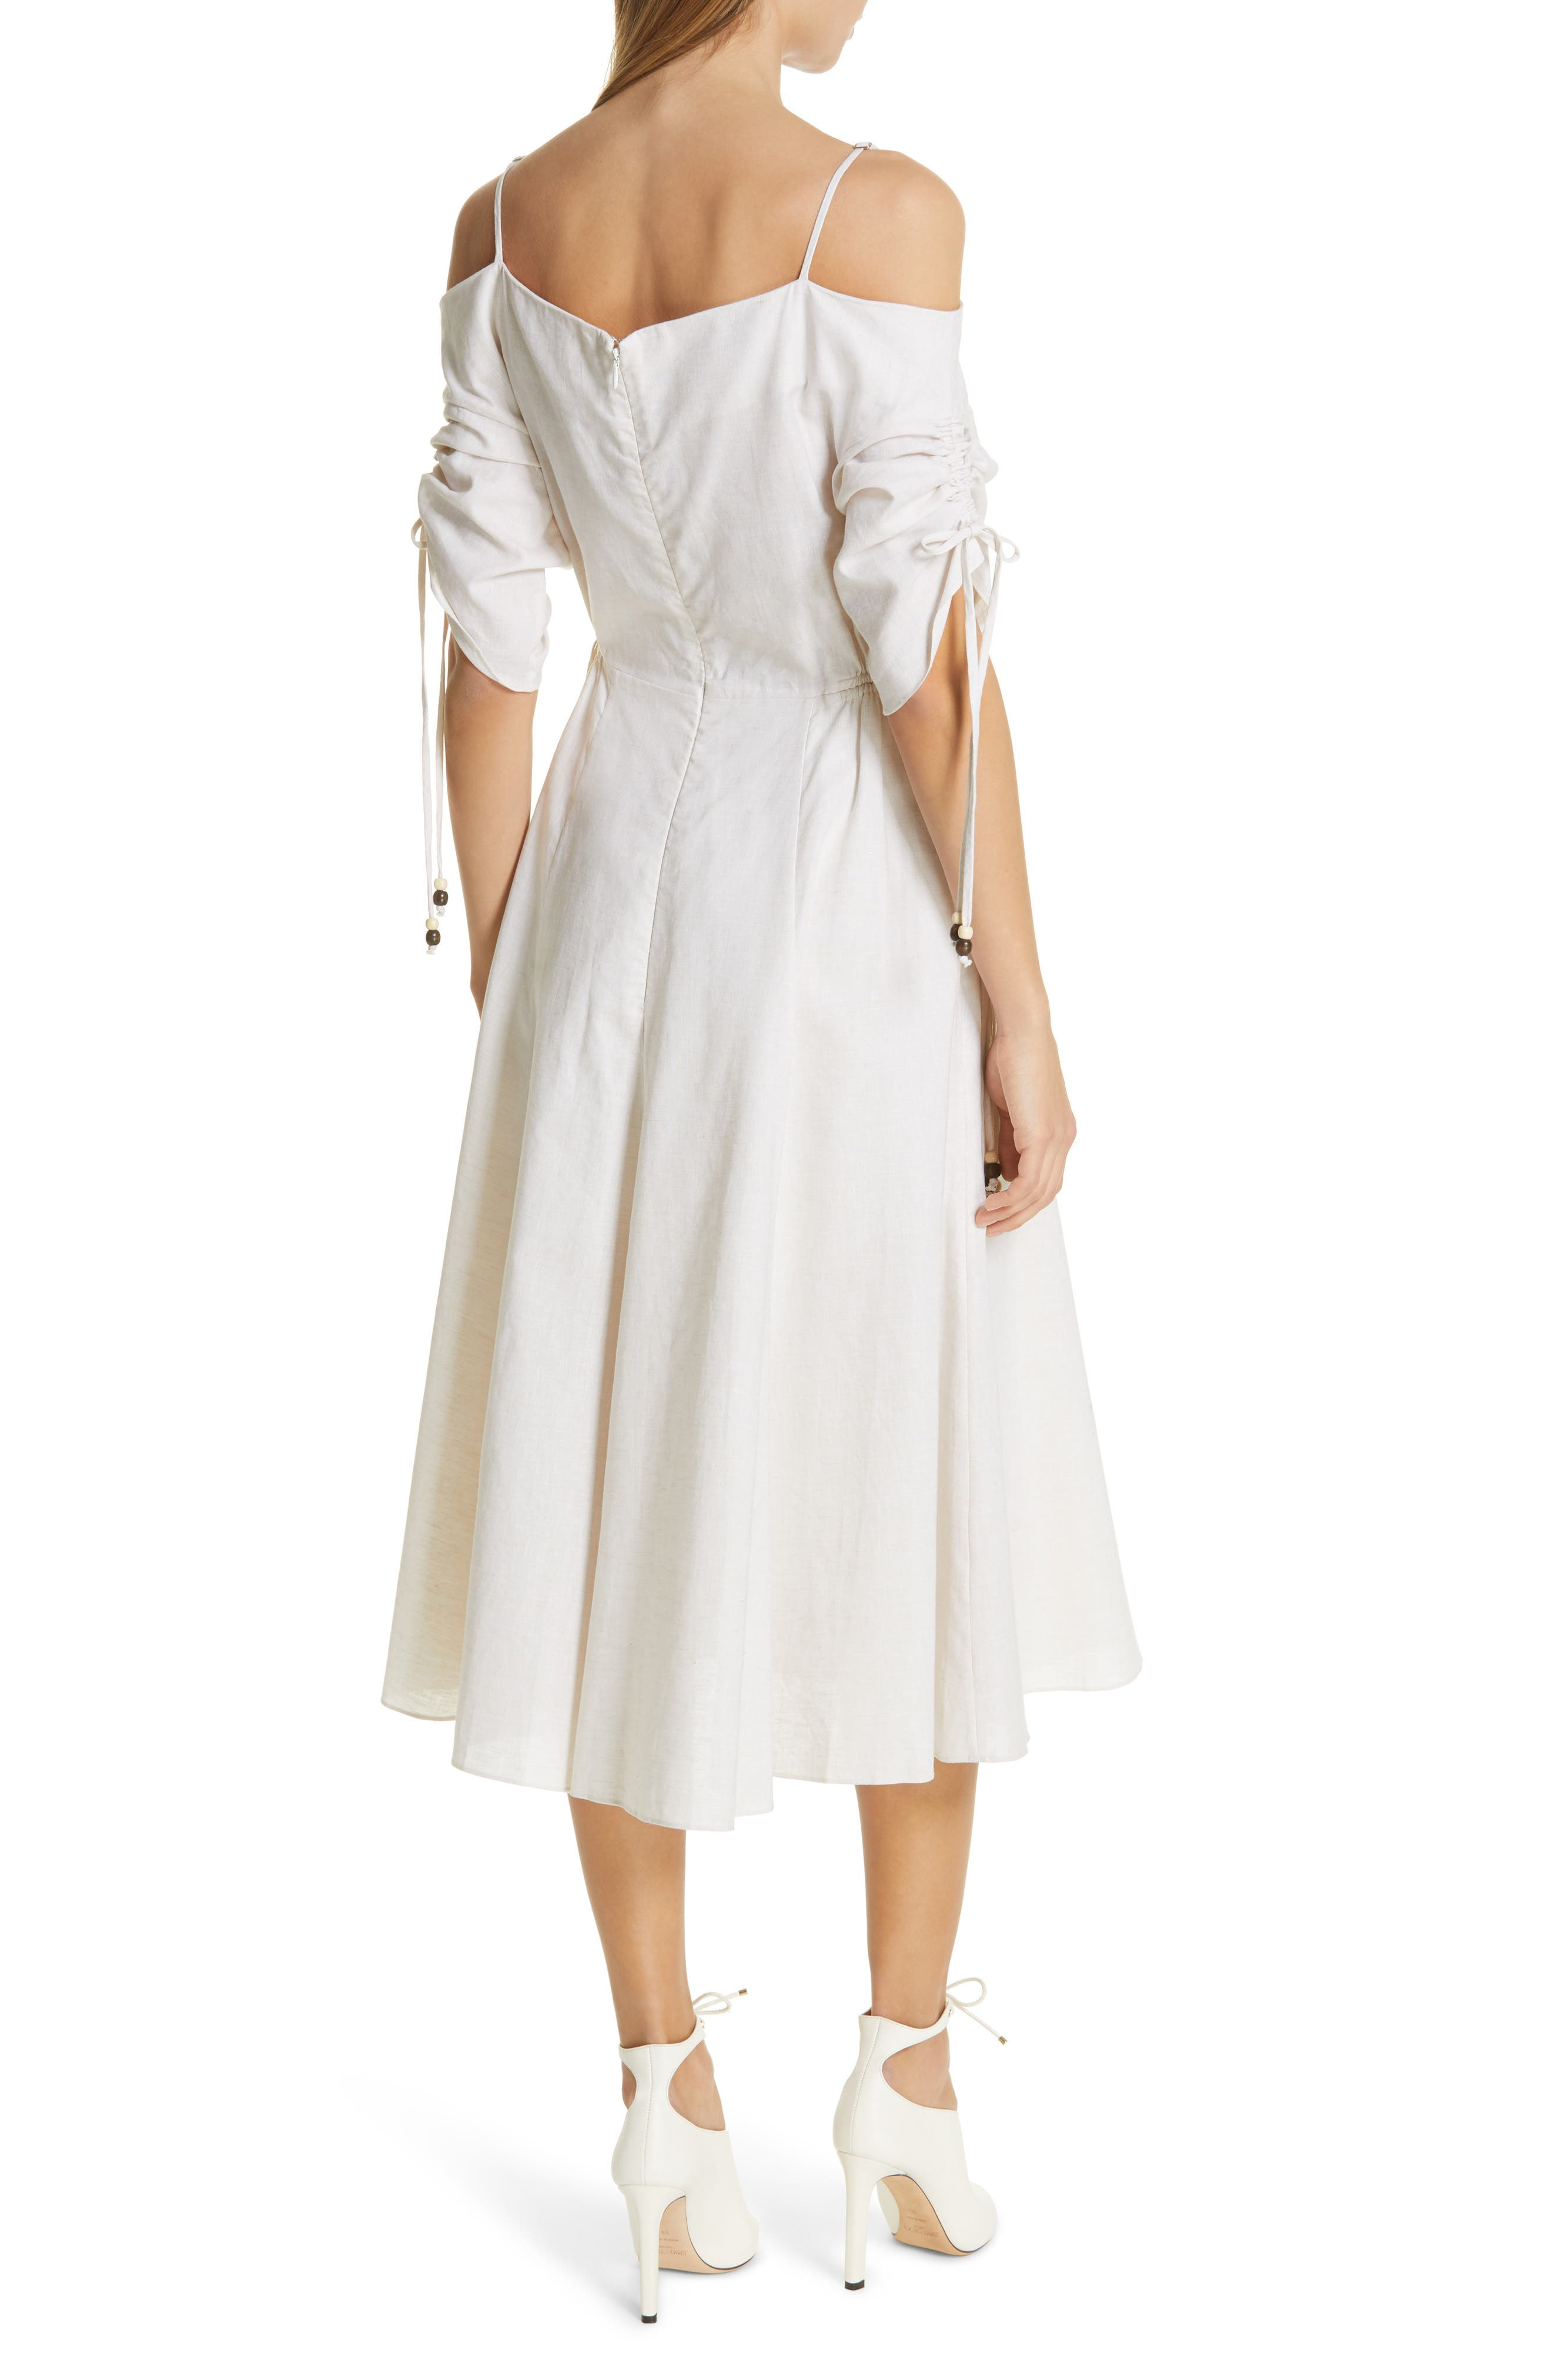 JONATHAN SIMKHAI,                             Off the Shoulder Cotton & Linen Dress,                             Alternate thumbnail 2, color,                             ECRU